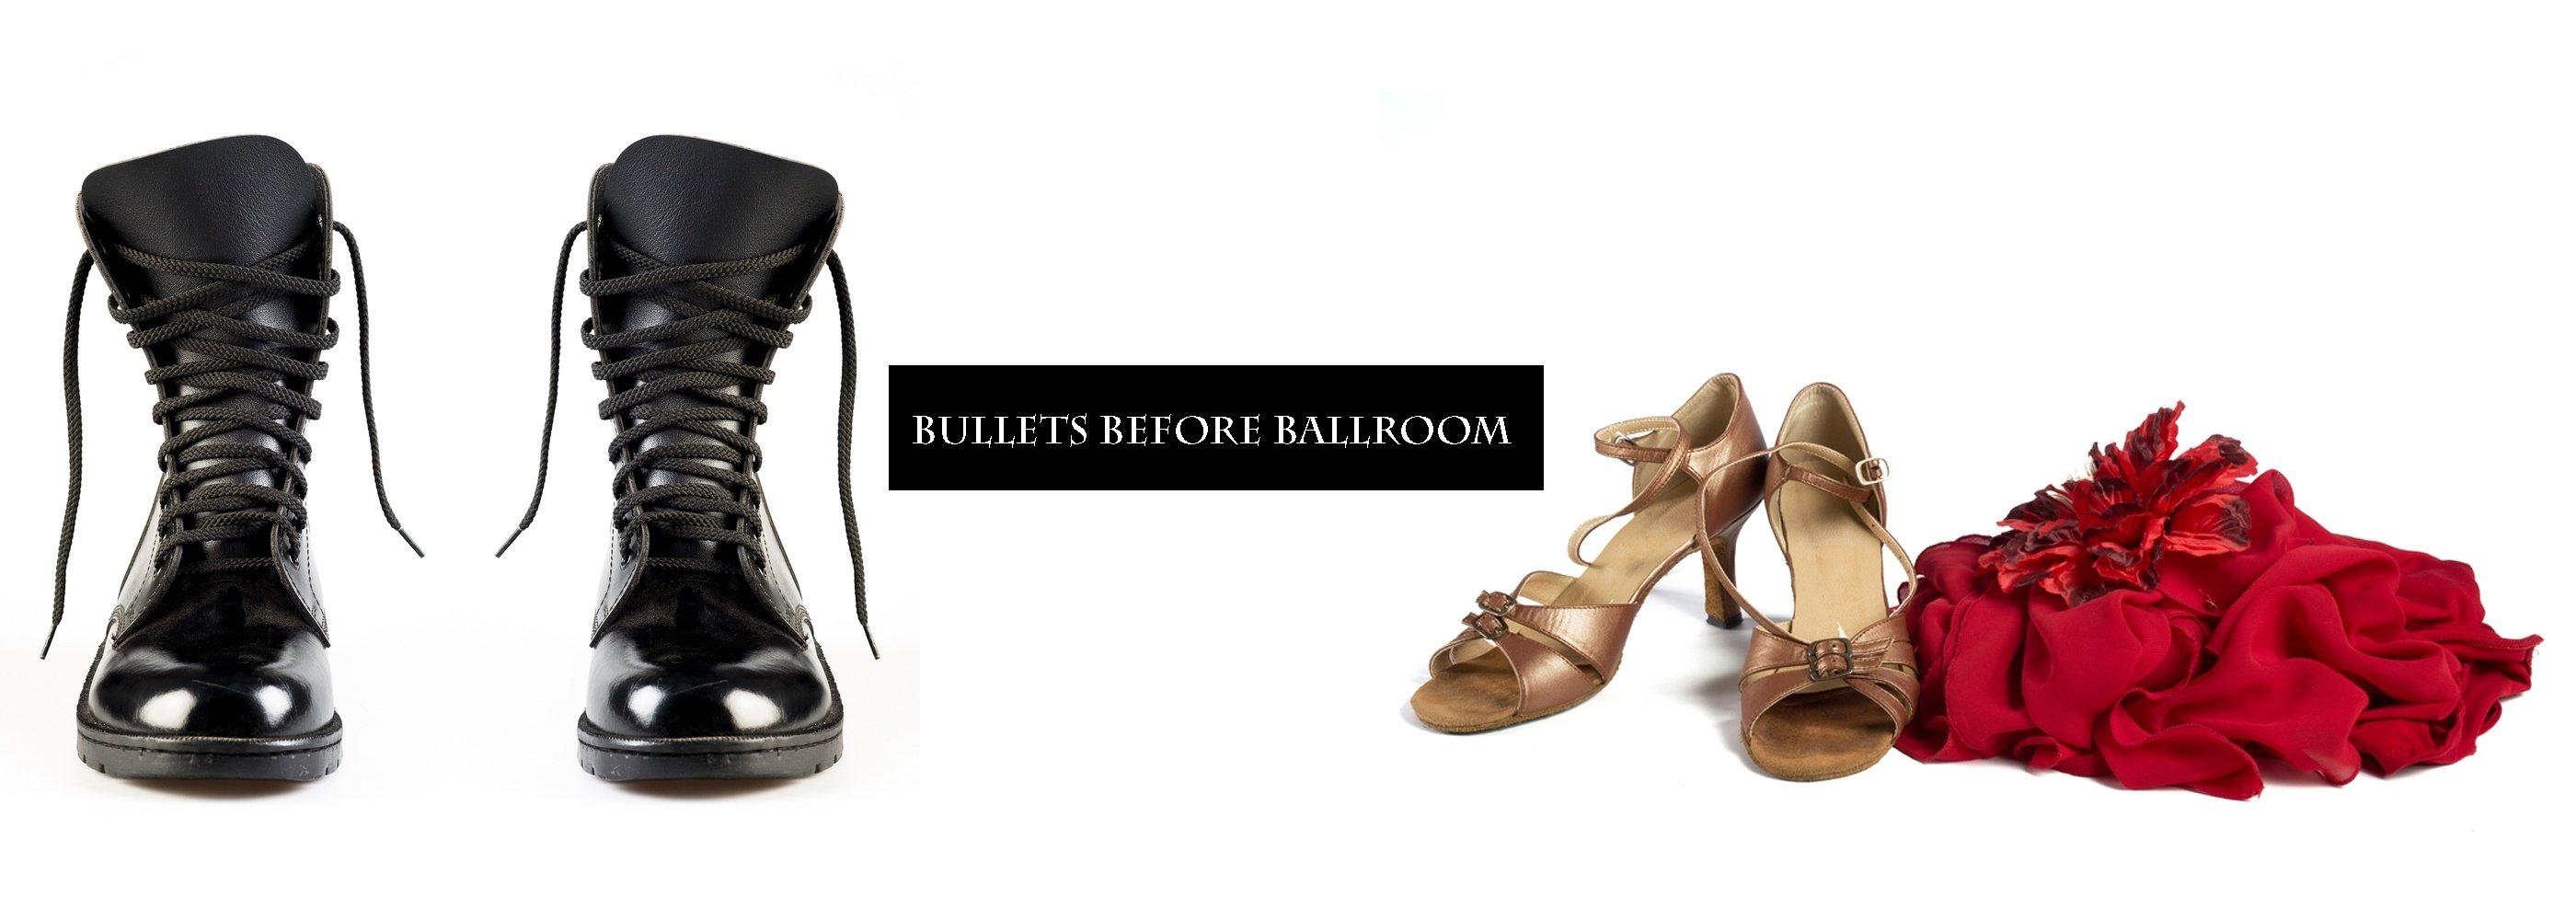 sarah-hudson-bullets-before-ballroom